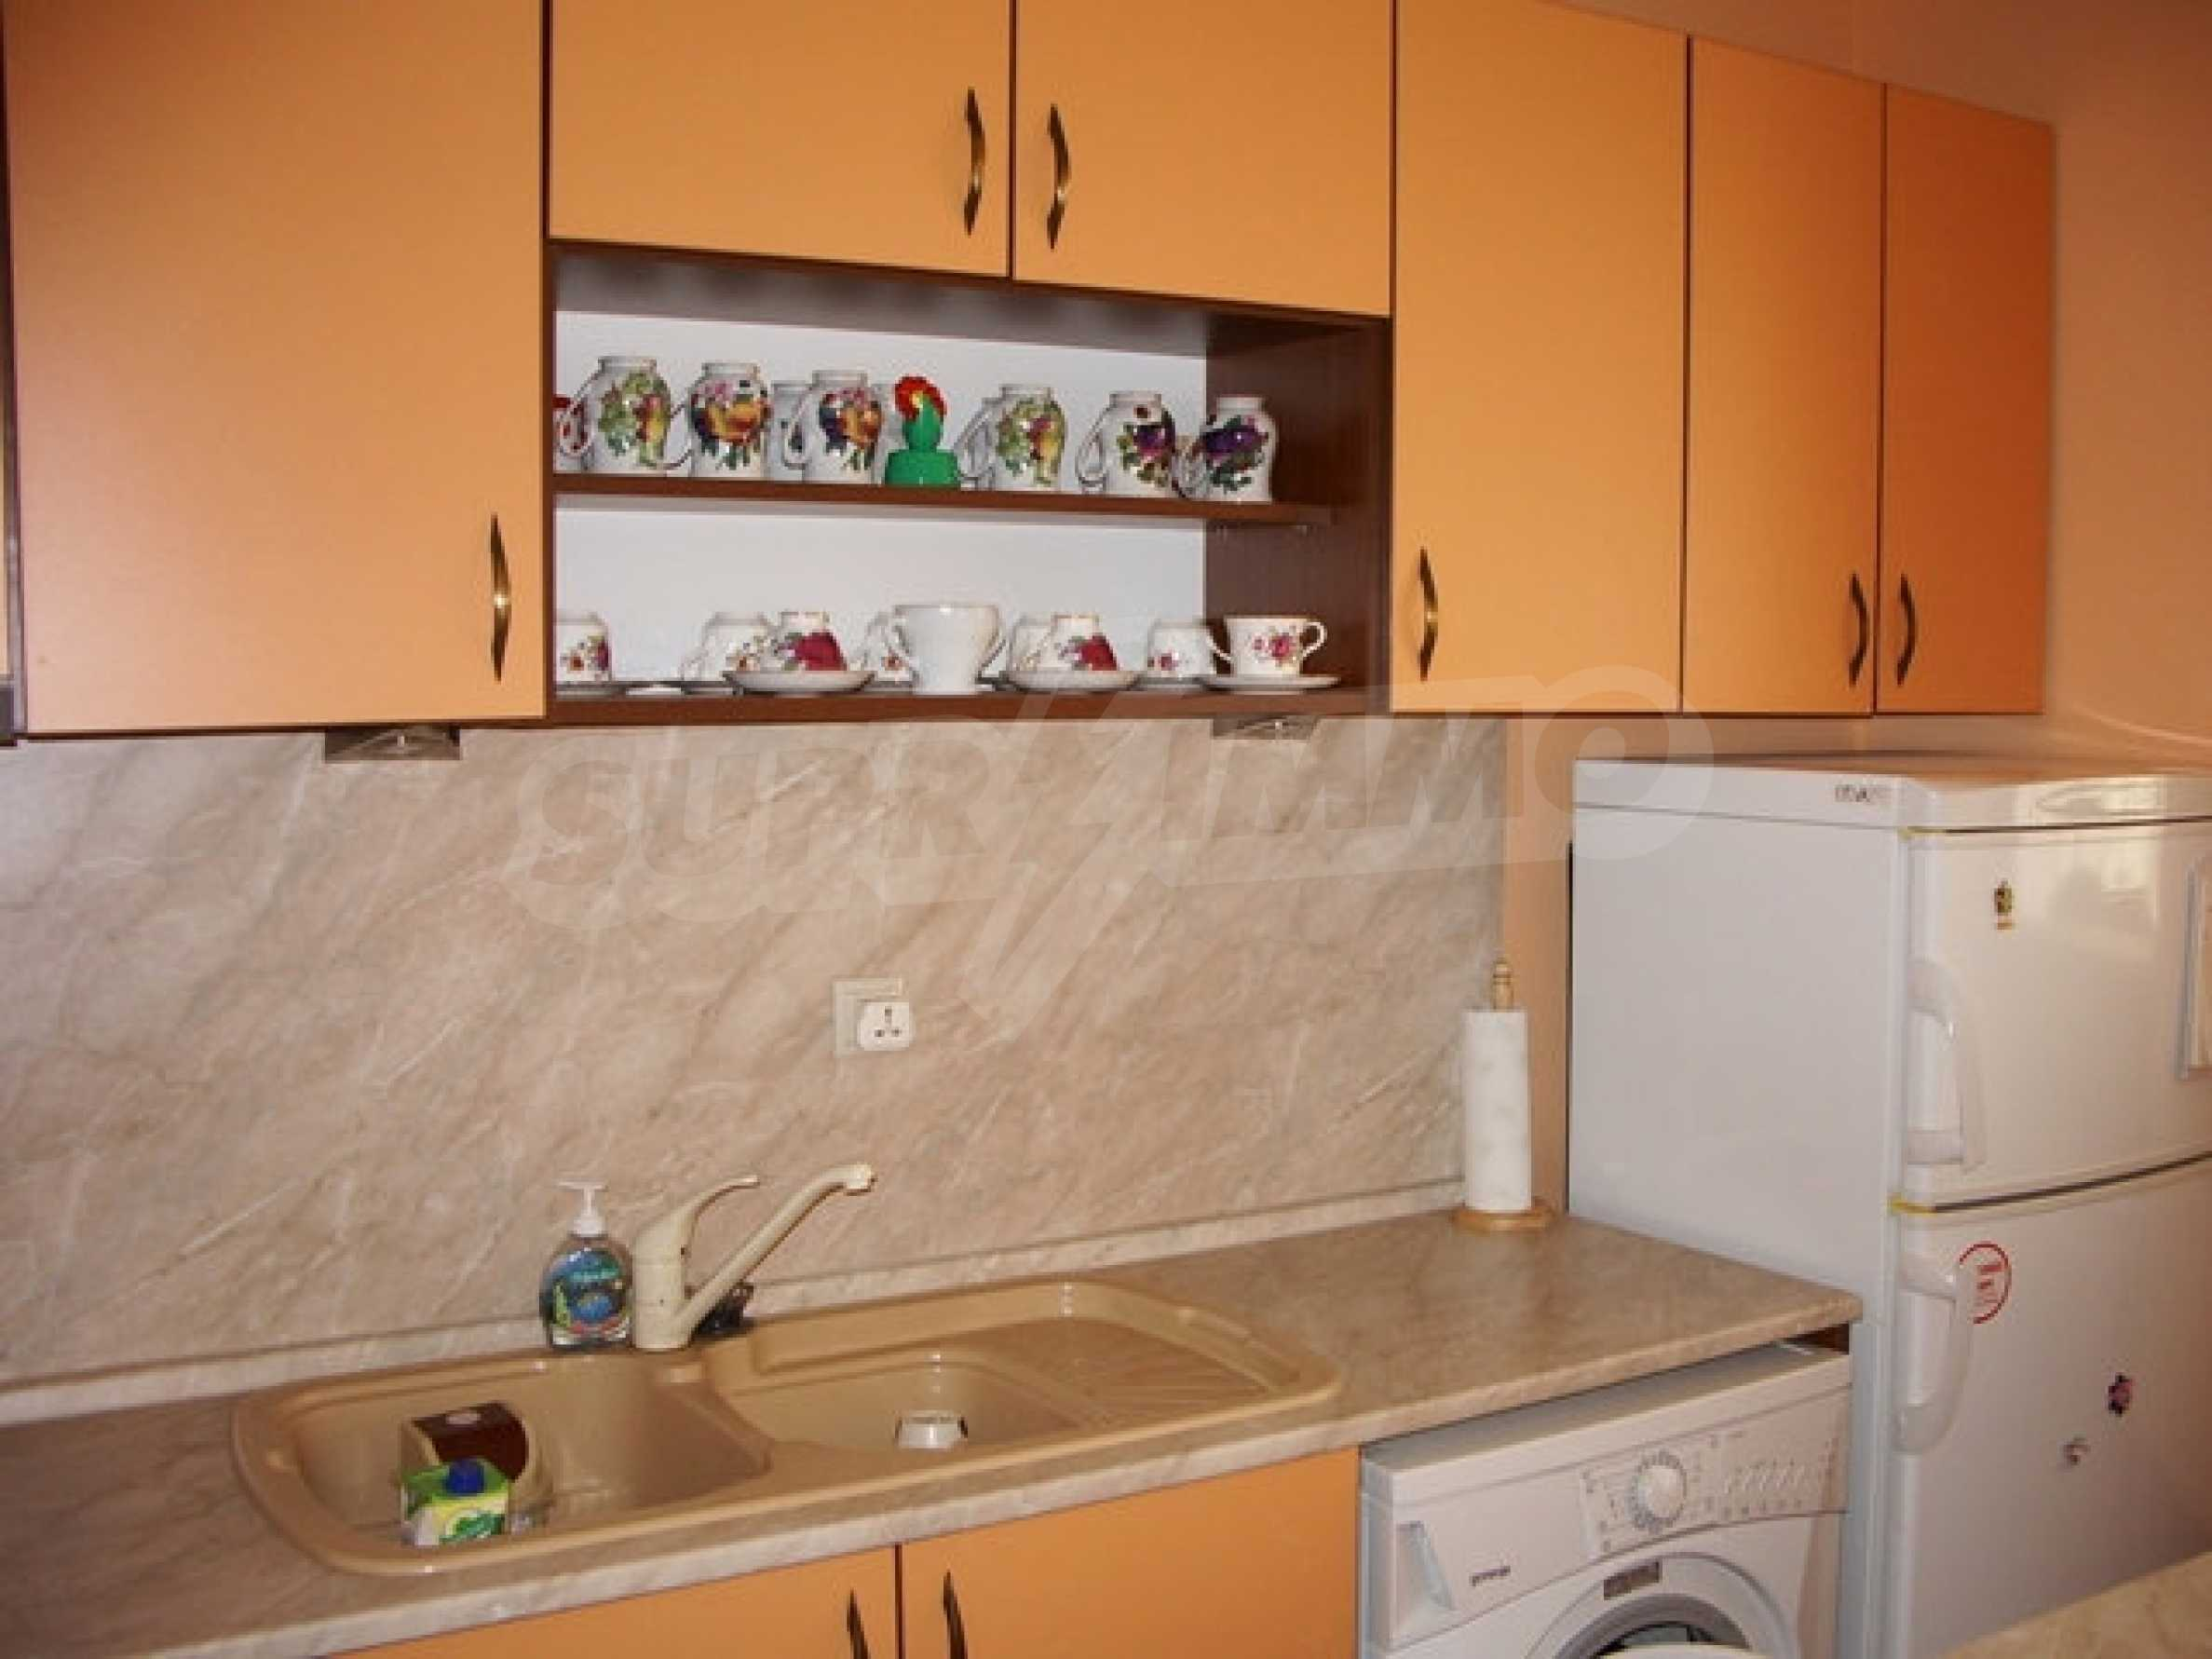 Квартира Евксиноград в Варне 4